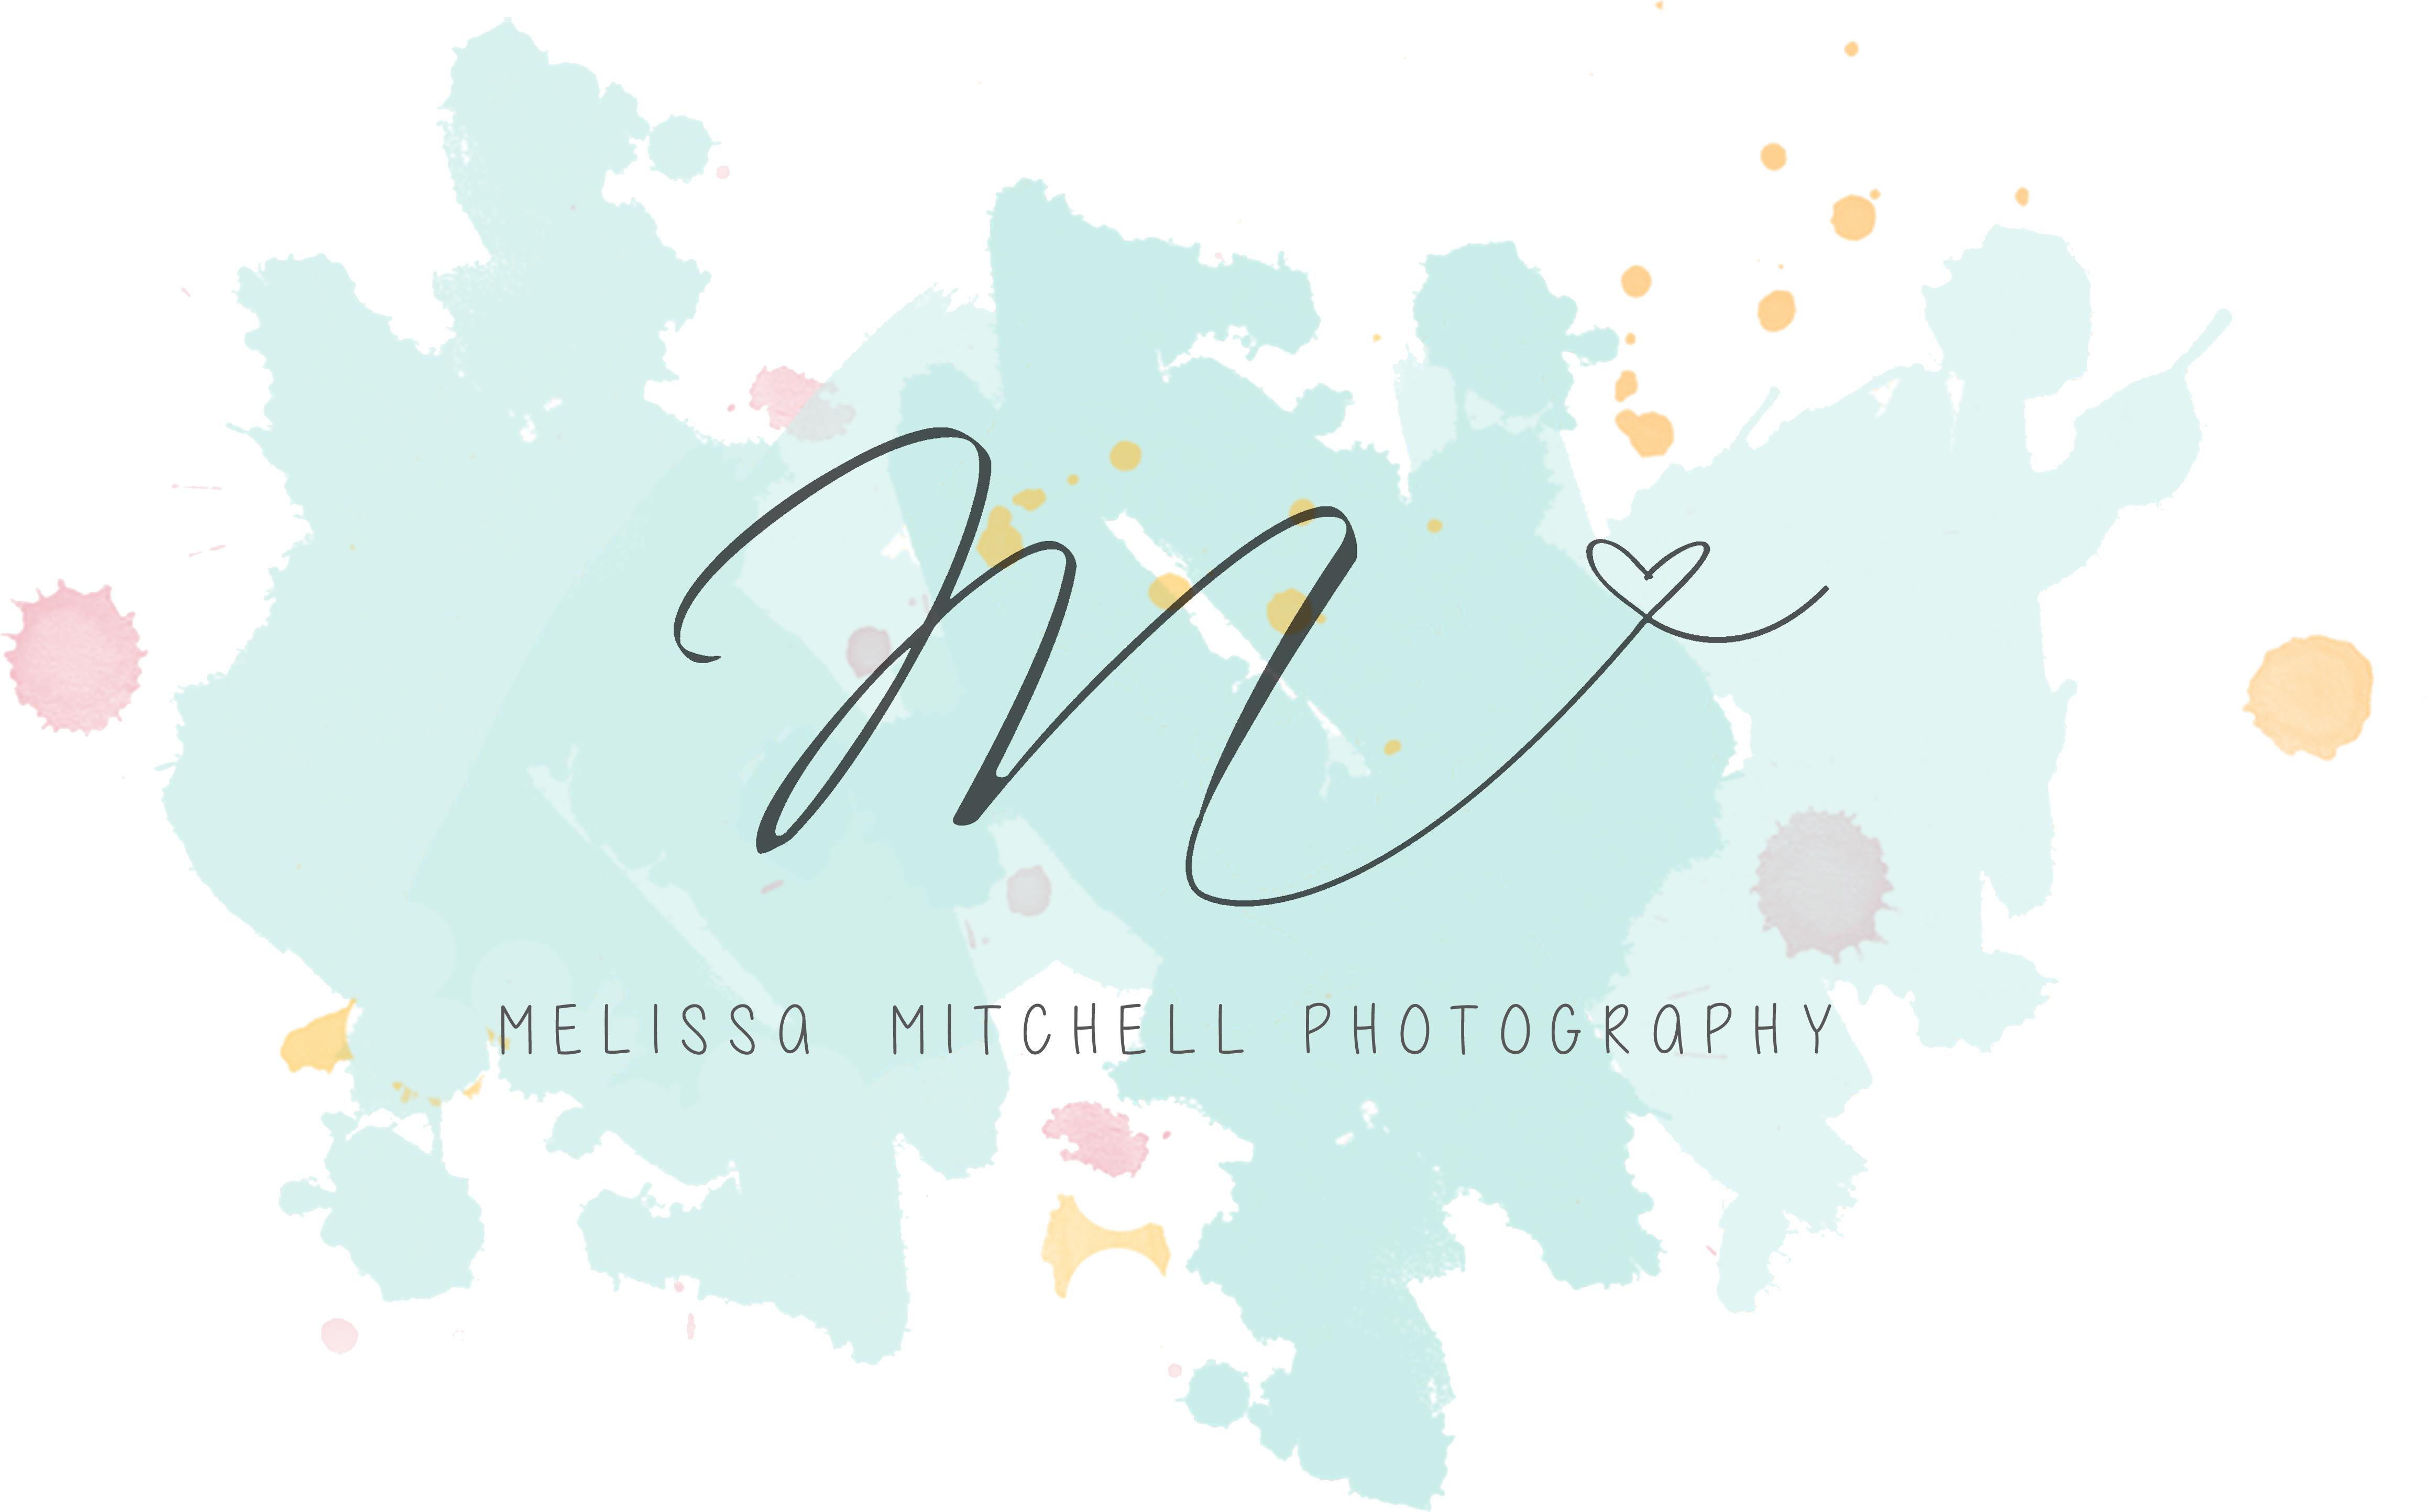 Melissa Mitchell